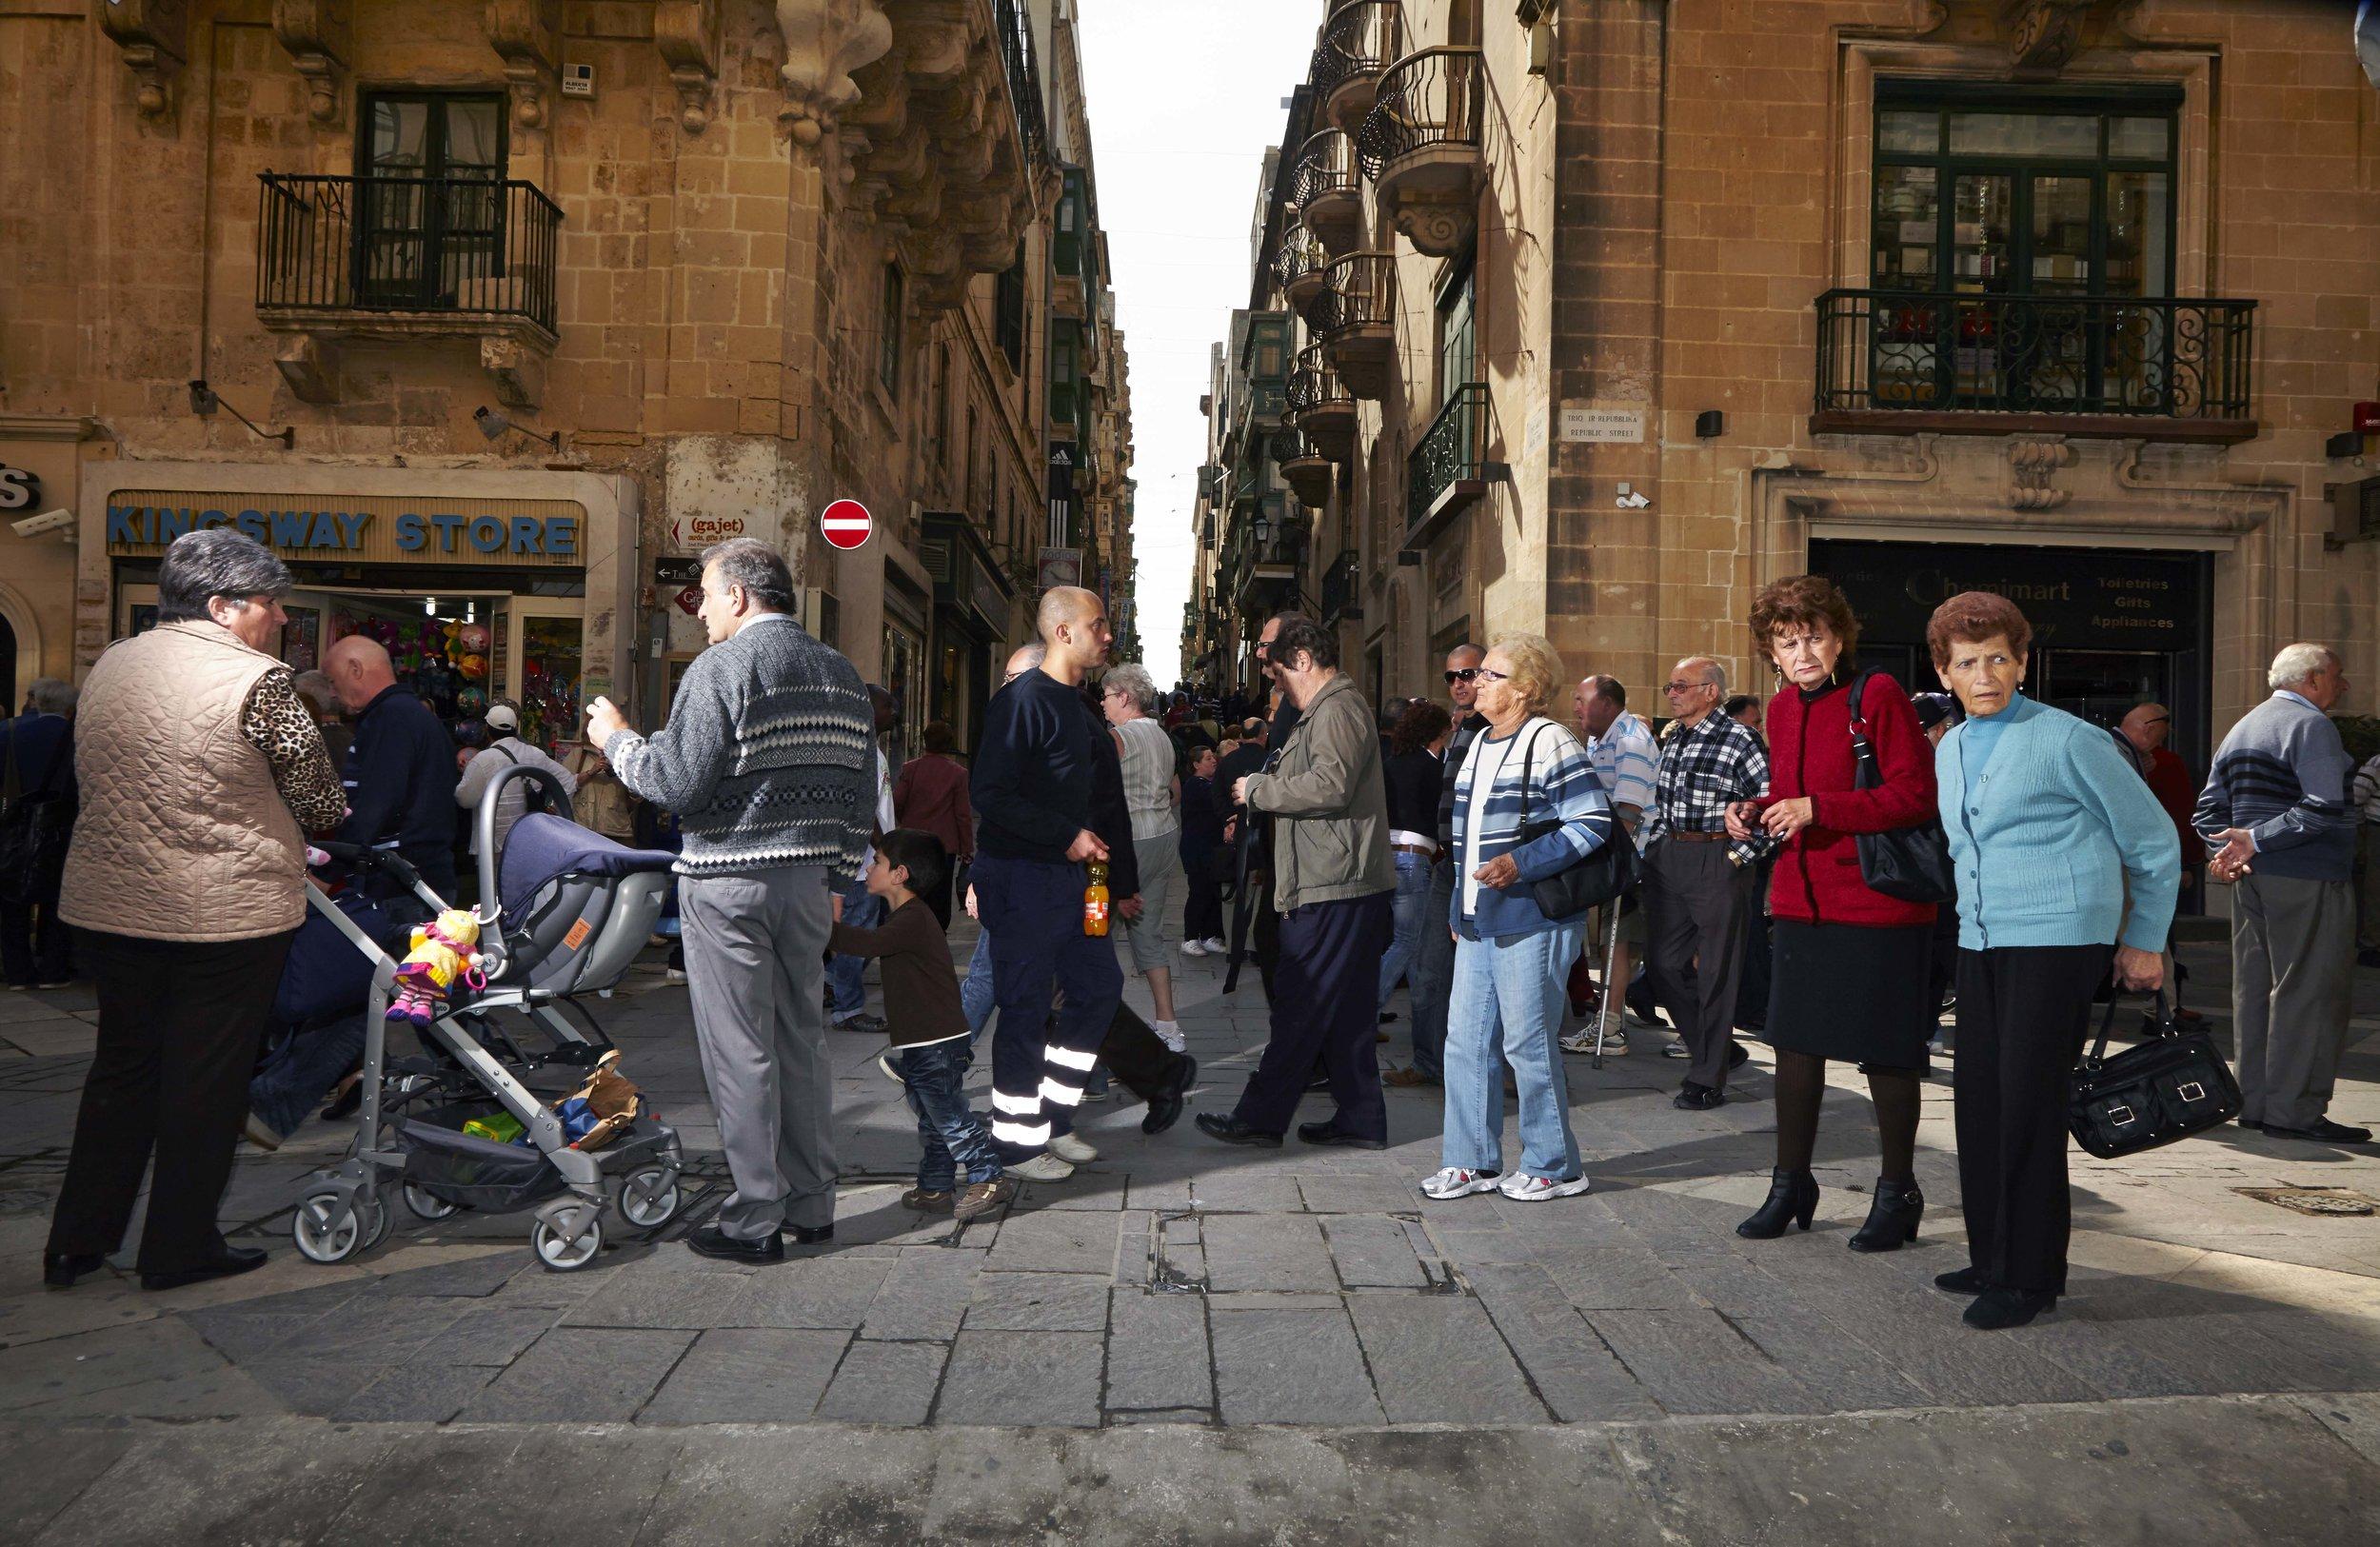 Valletta_Malta_Crossing_Europe_Poike Stomps_MG_5634.jpg